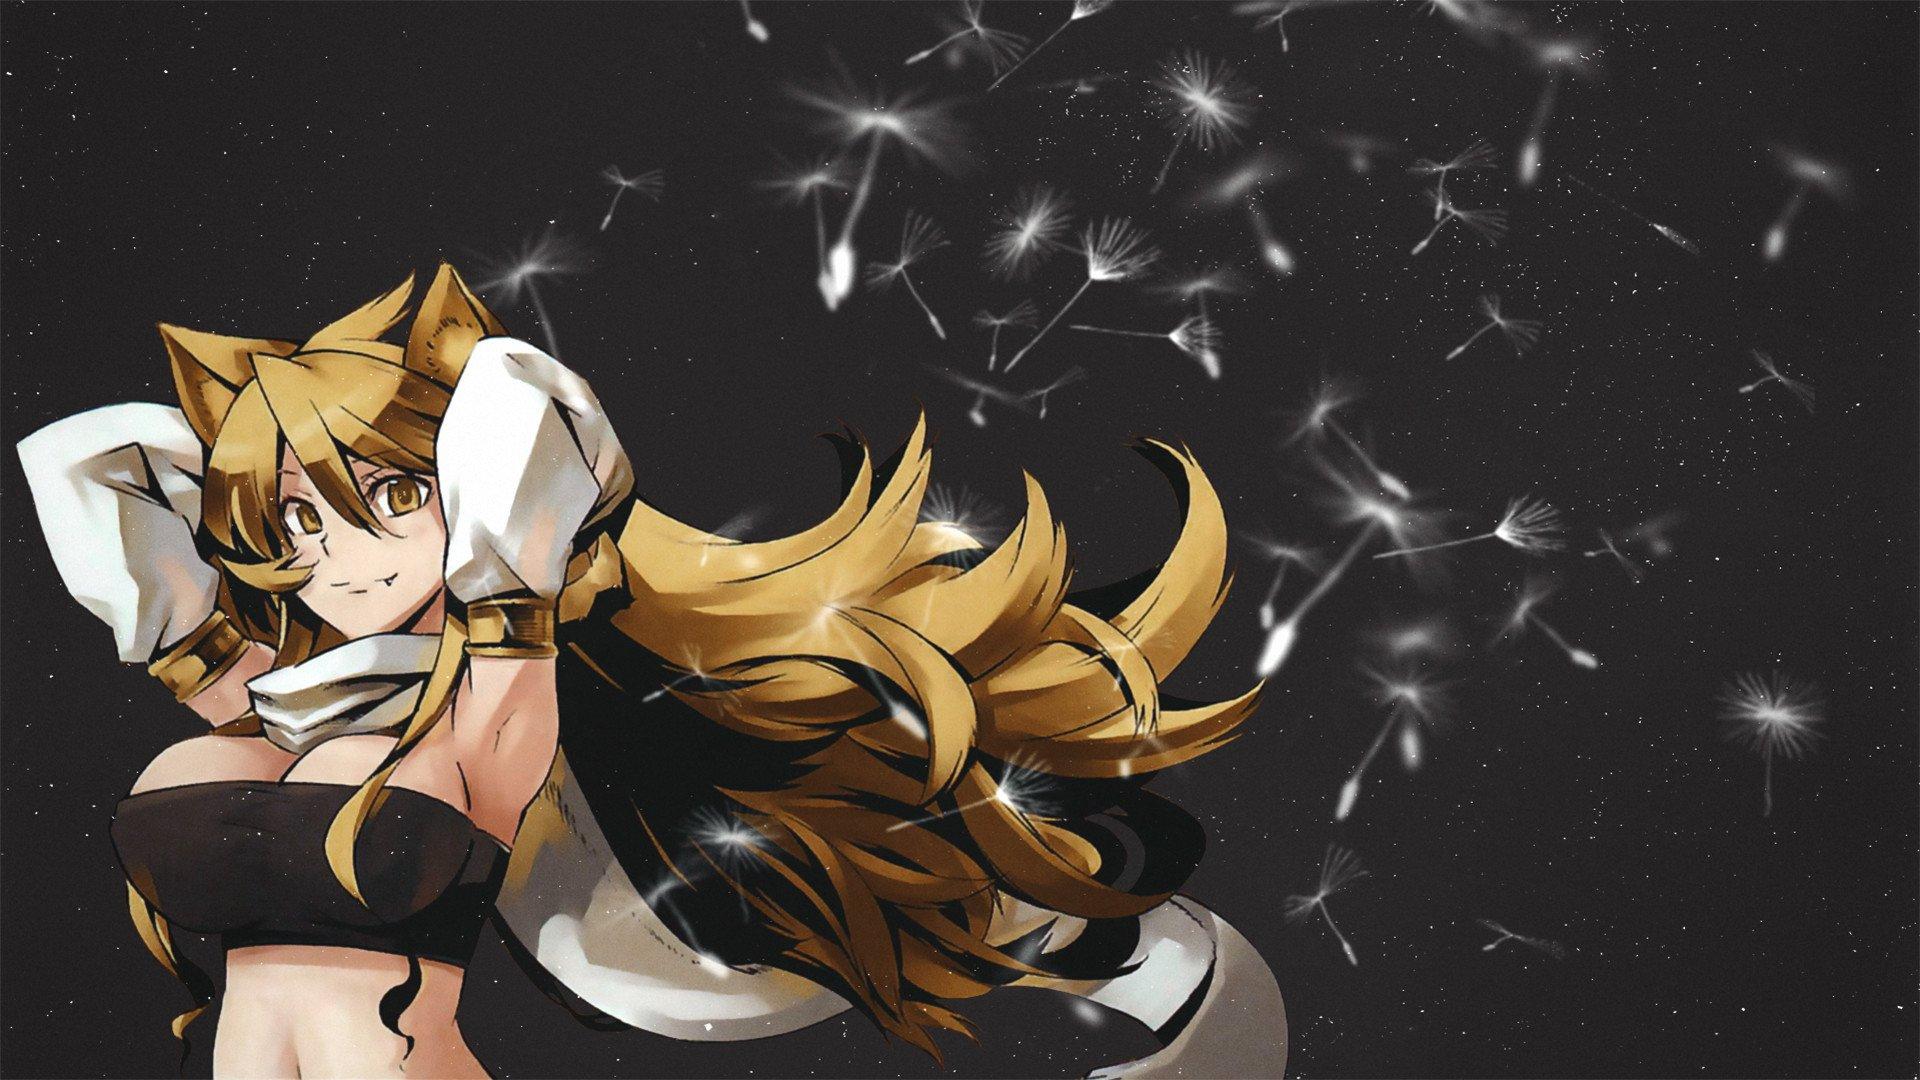 Akame ga Kill! HD Wallpaper | Background Image | 1920x1080 ...